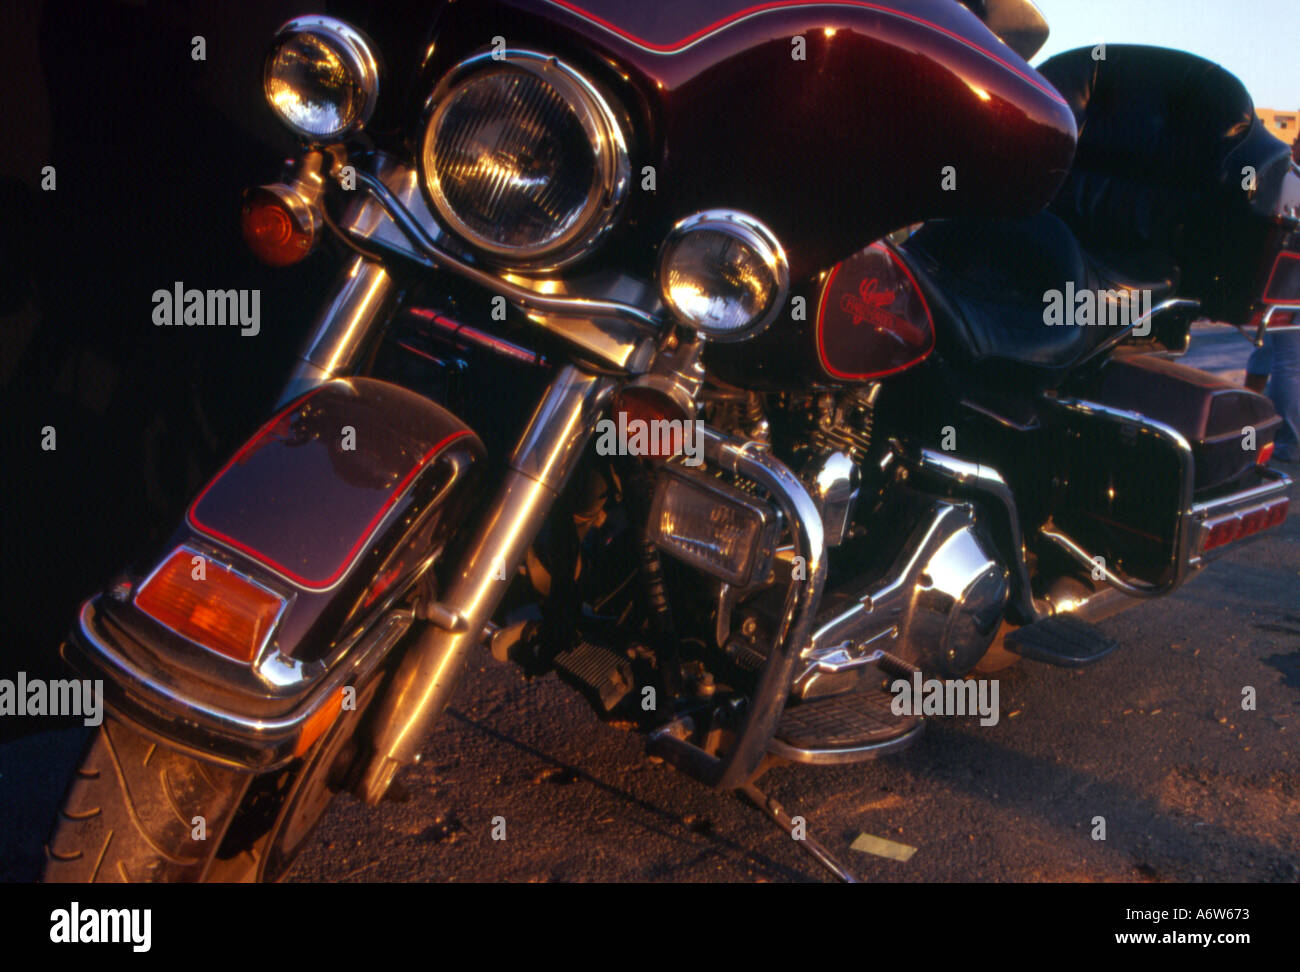 motorcycle model Harley Davidson - Stock Image